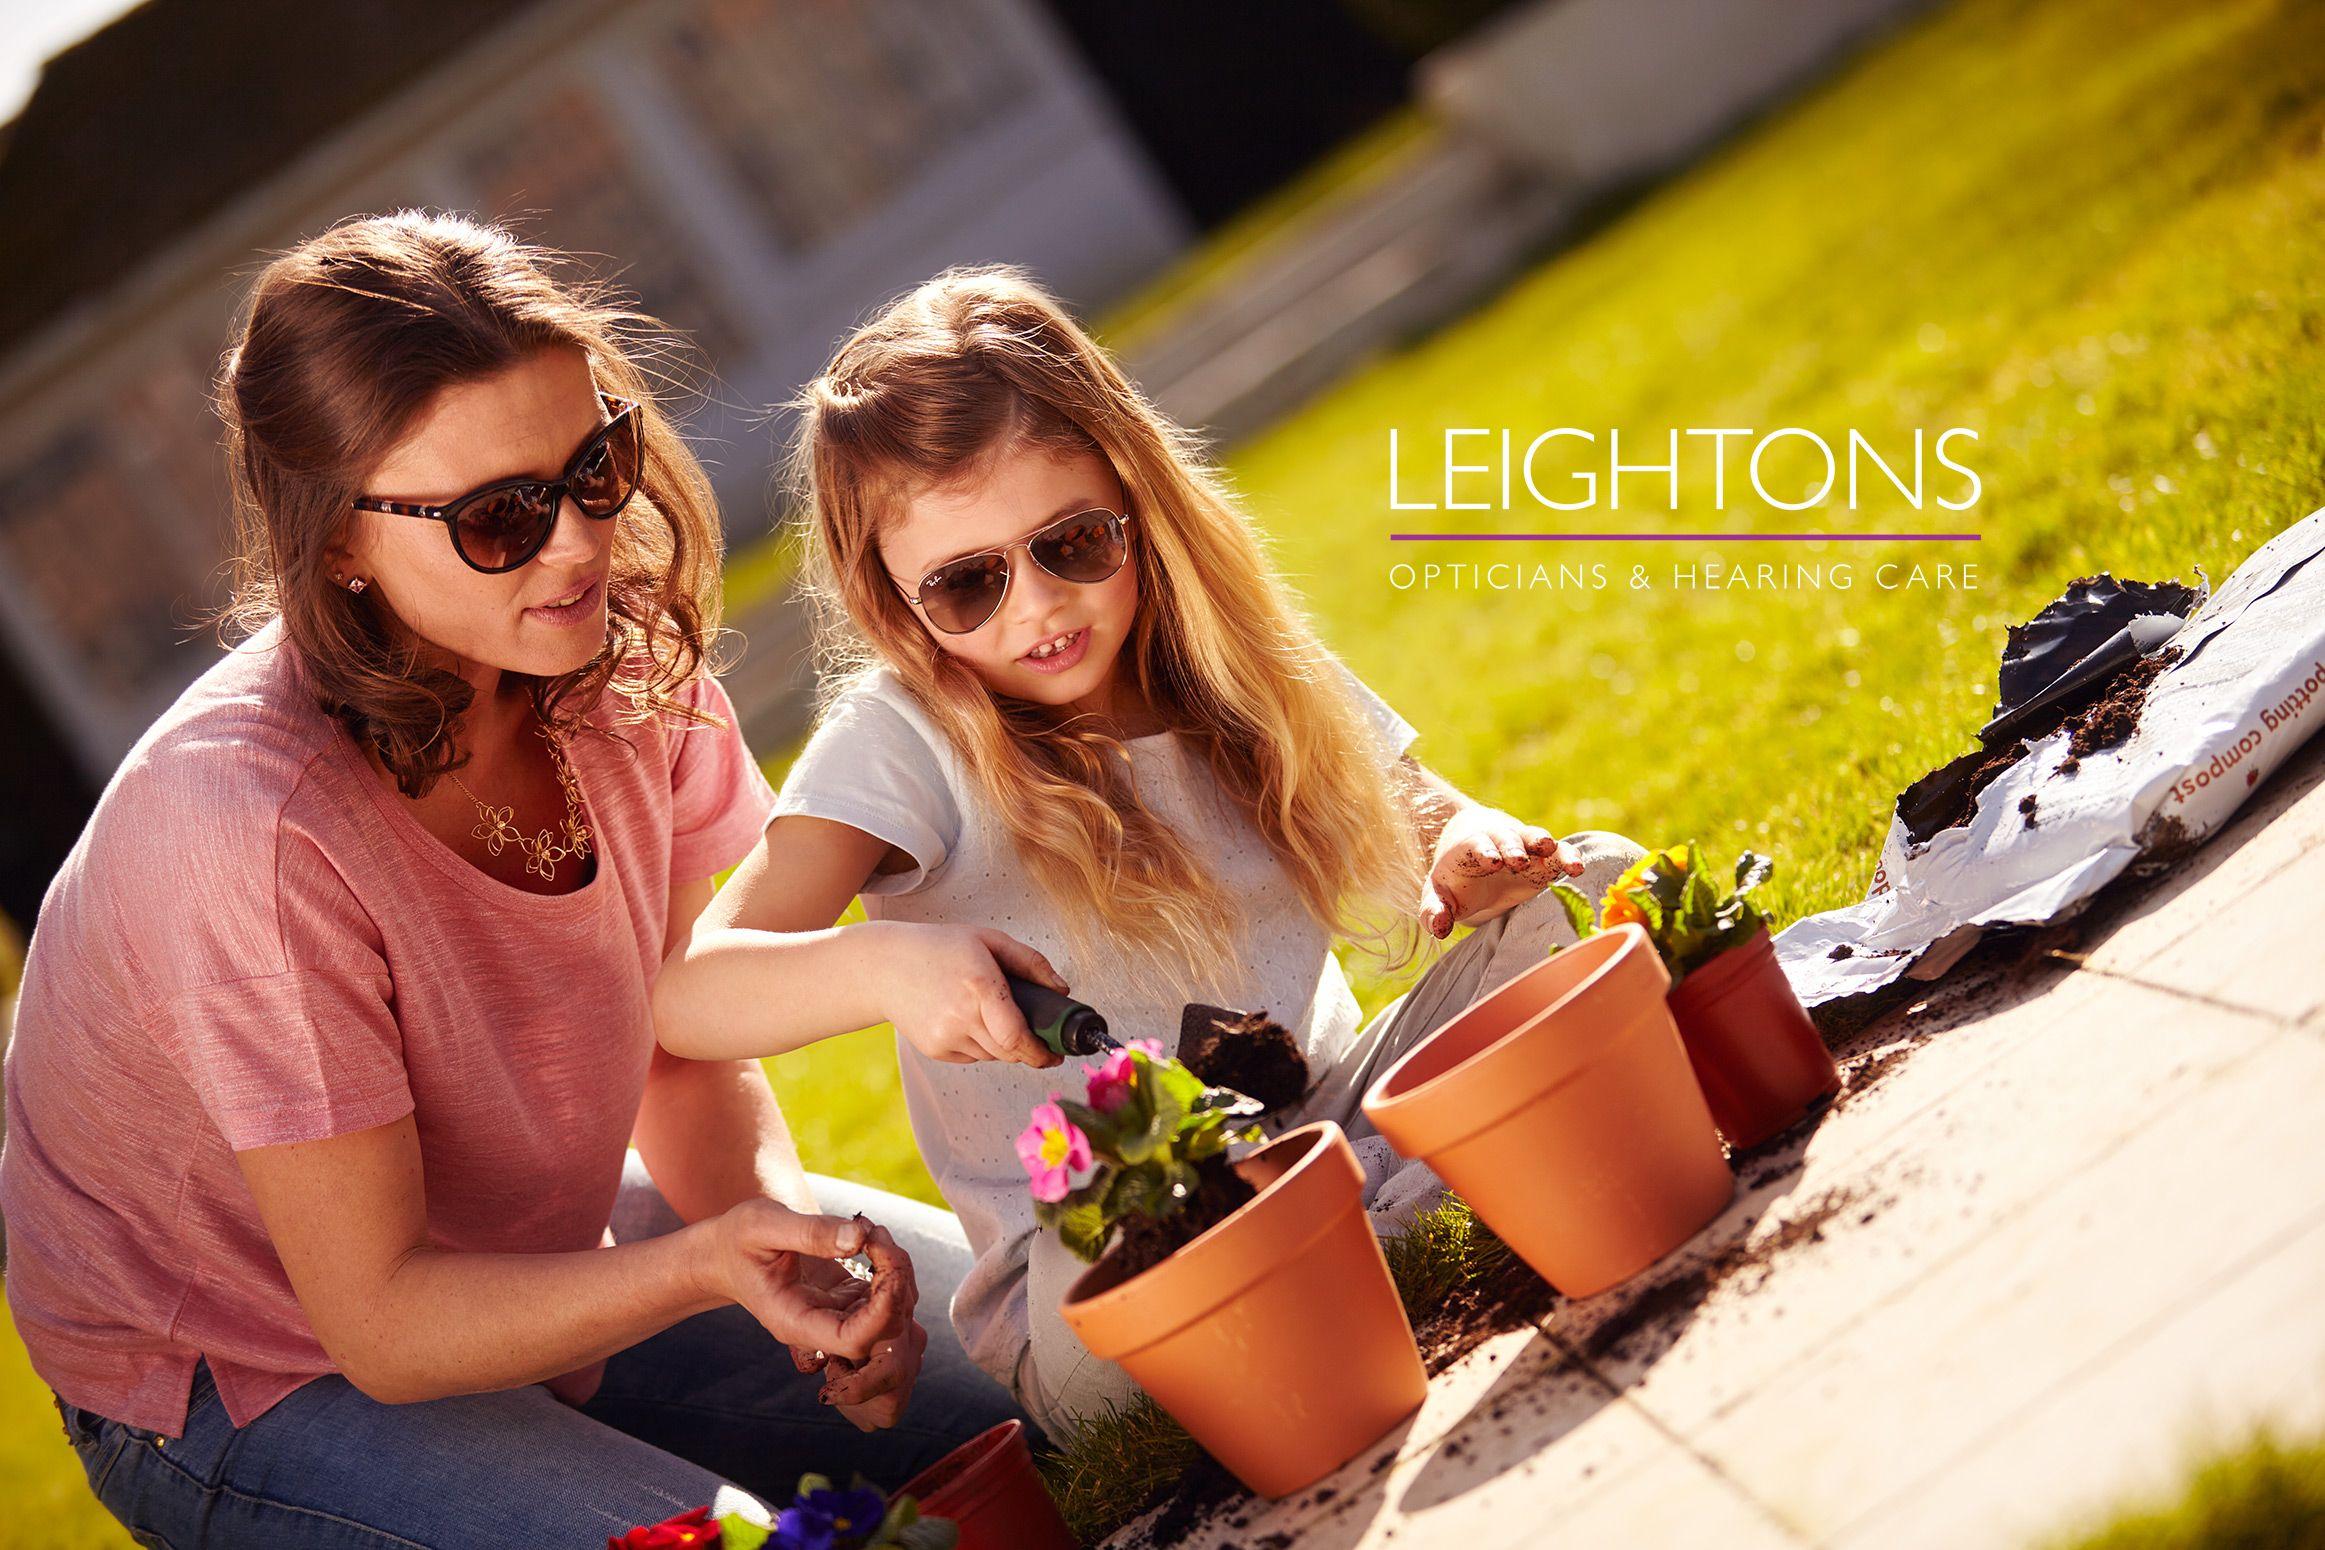 lifestyle-grandparents-garden-family-advertising-photographer-london-lifestyle-family-opticians-ruth-rose-5-compressor.jpg